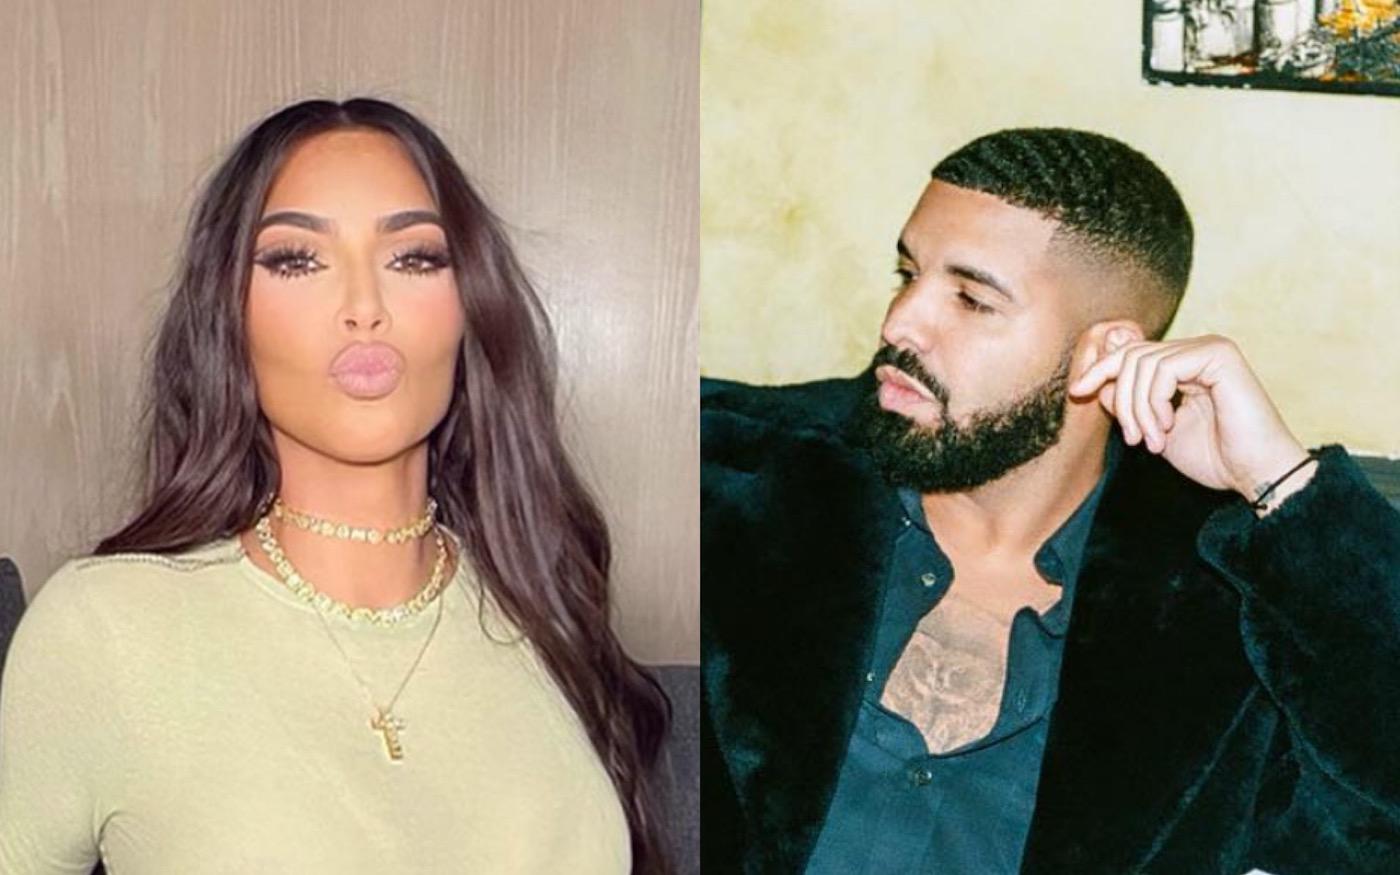 Drake Quickly Shuts Down Kim Kardashian Dating Rumors Amid Kanye West Divorce